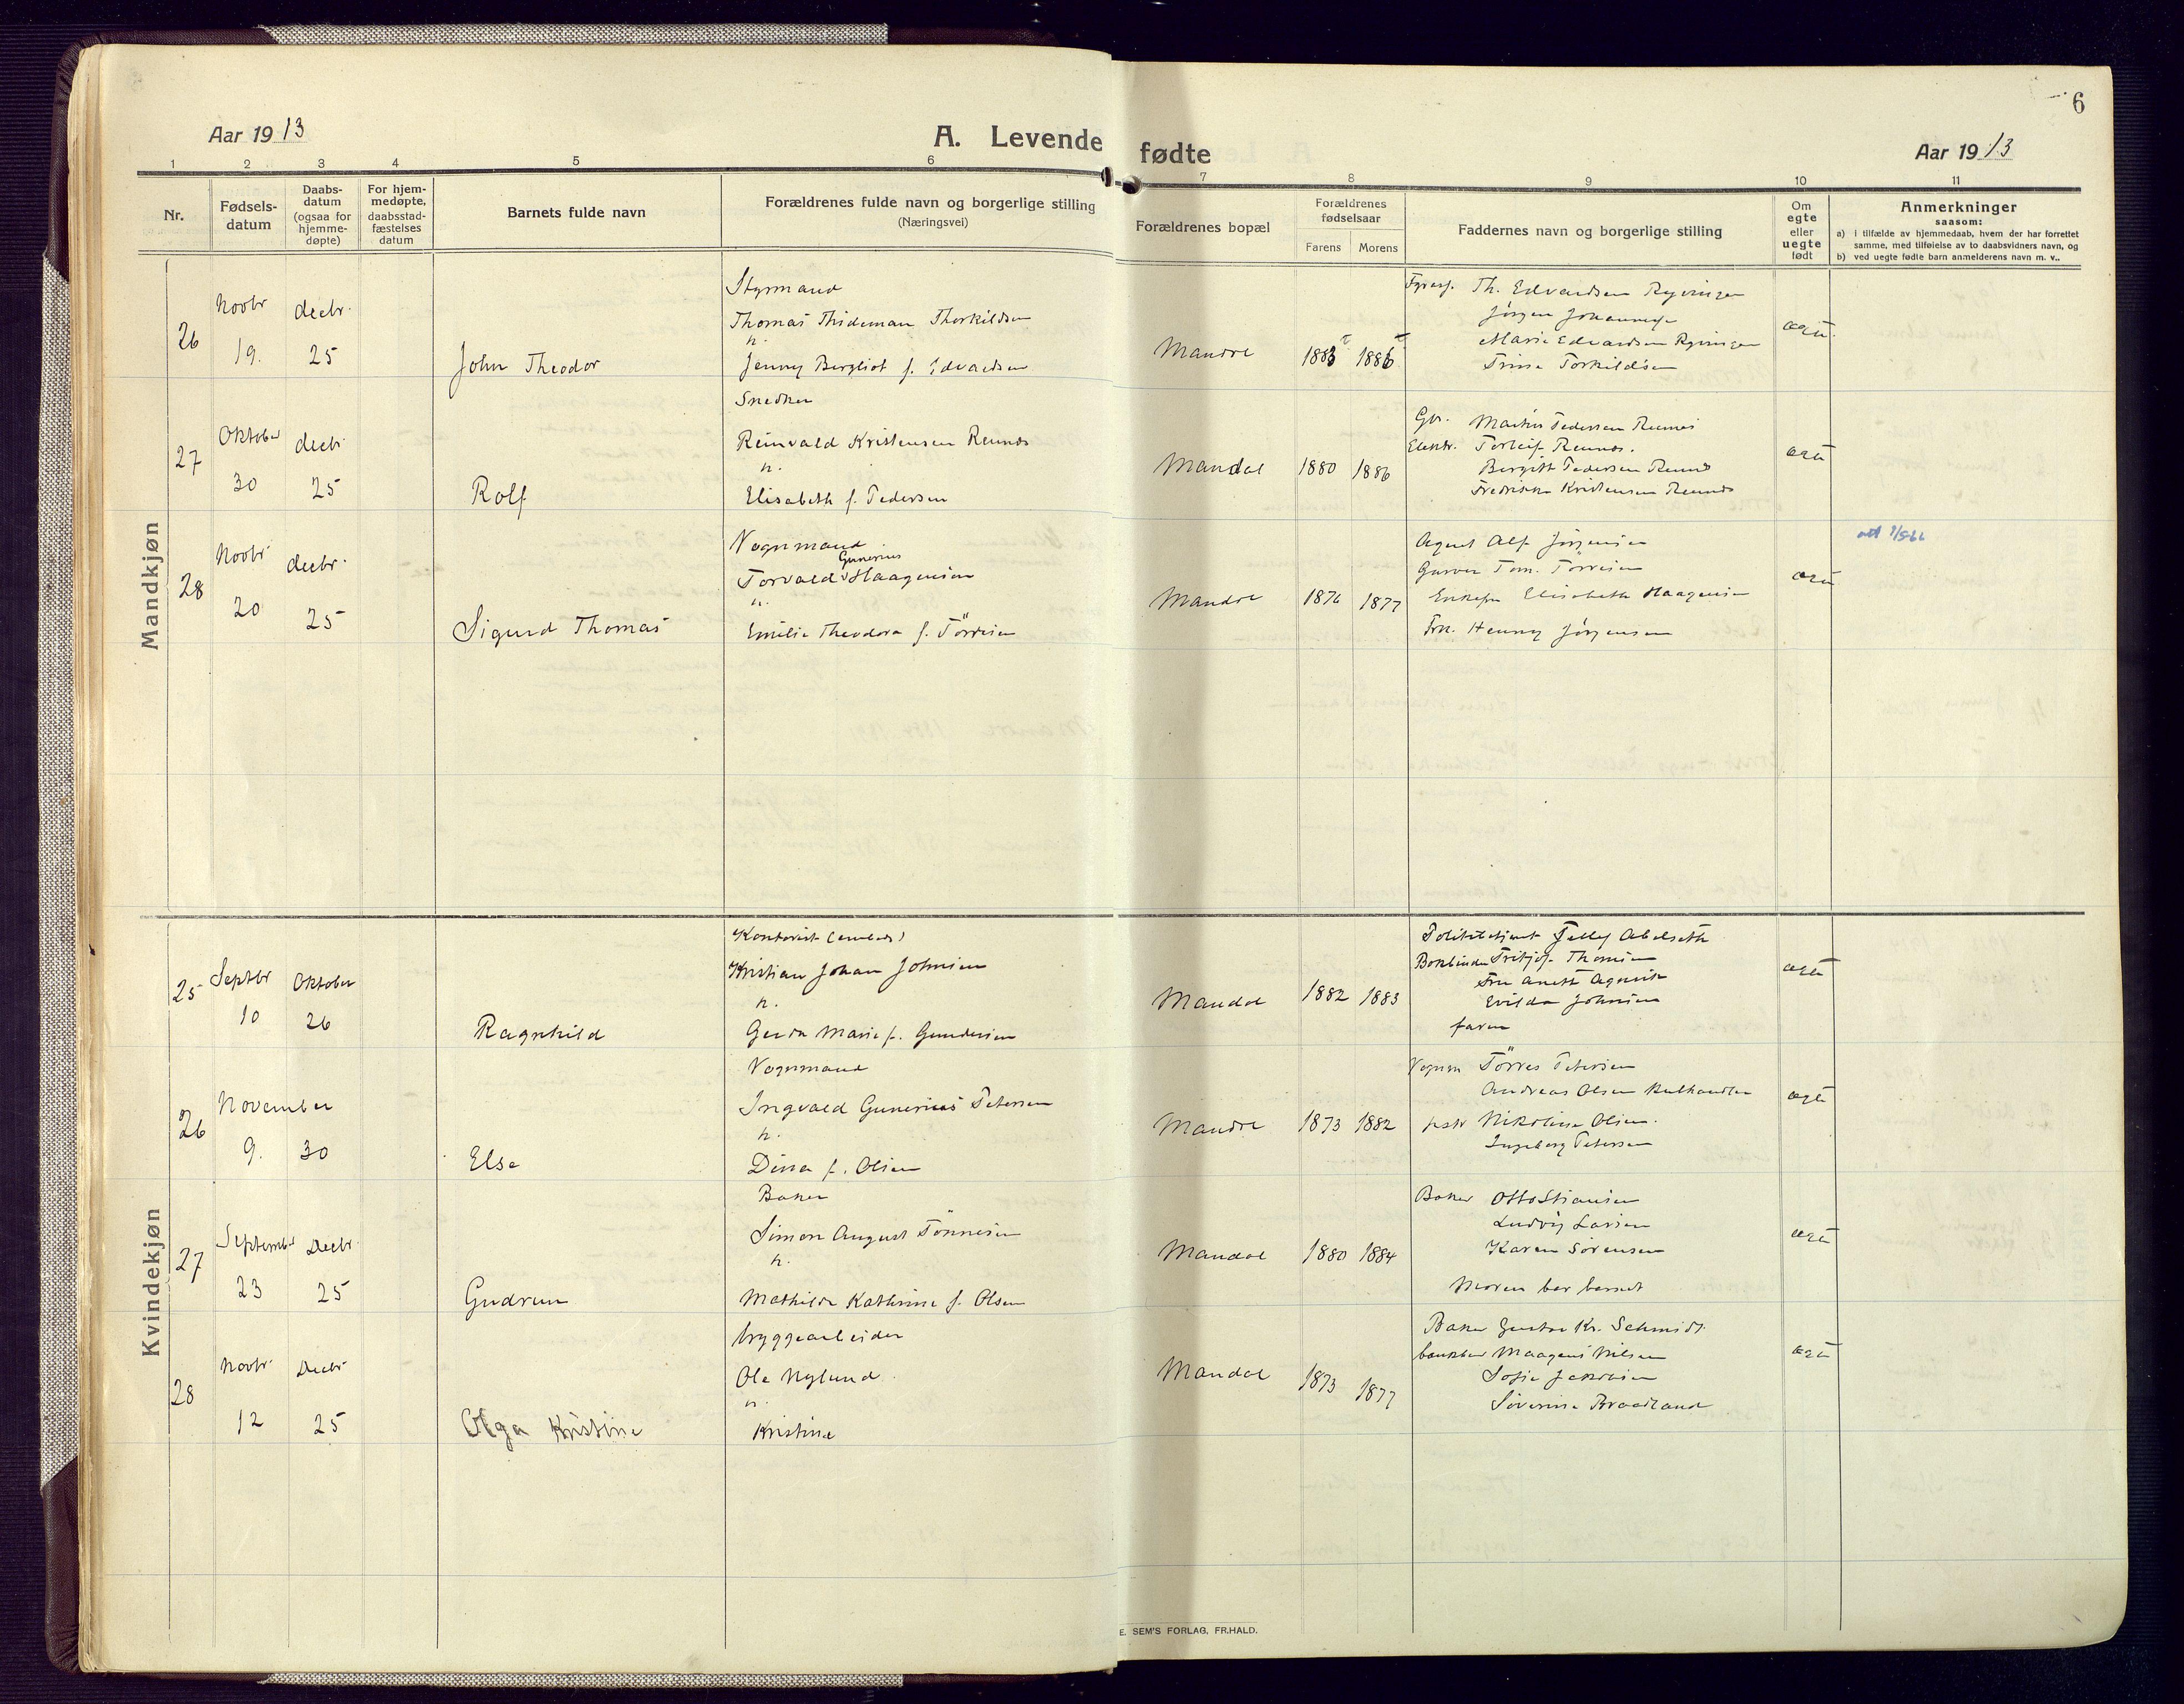 SAK, Mandal sokneprestkontor, F/Fa/Fac/L0001: Ministerialbok nr. A 1, 1913-1925, s. 6